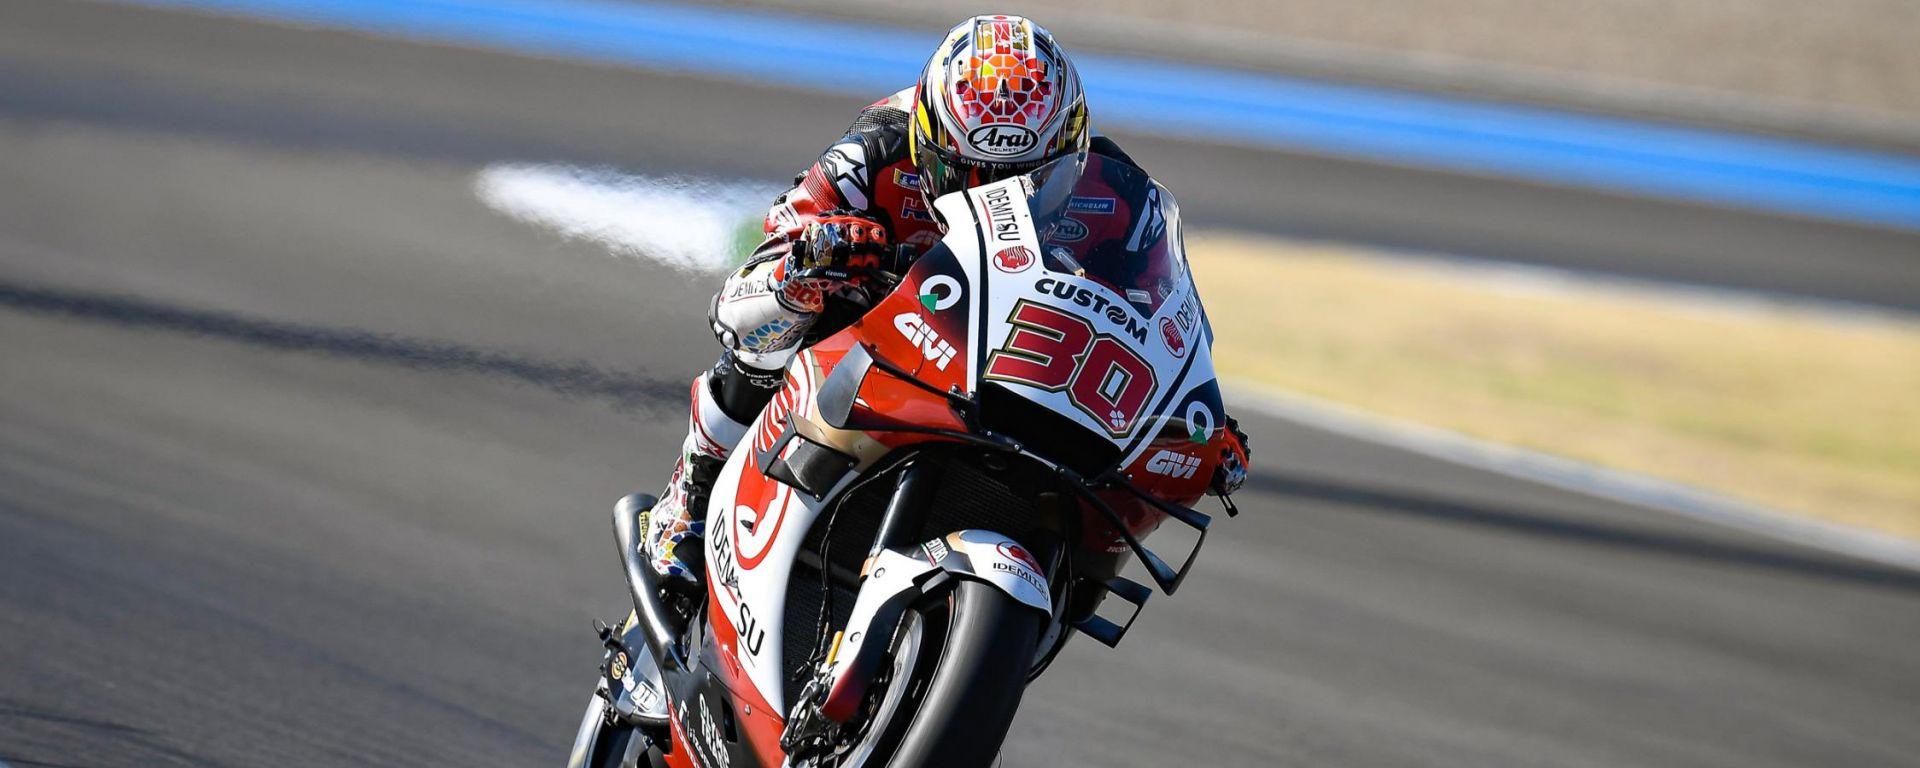 MotoGP Andalusia 2020, Taka Nakagami (Honda)